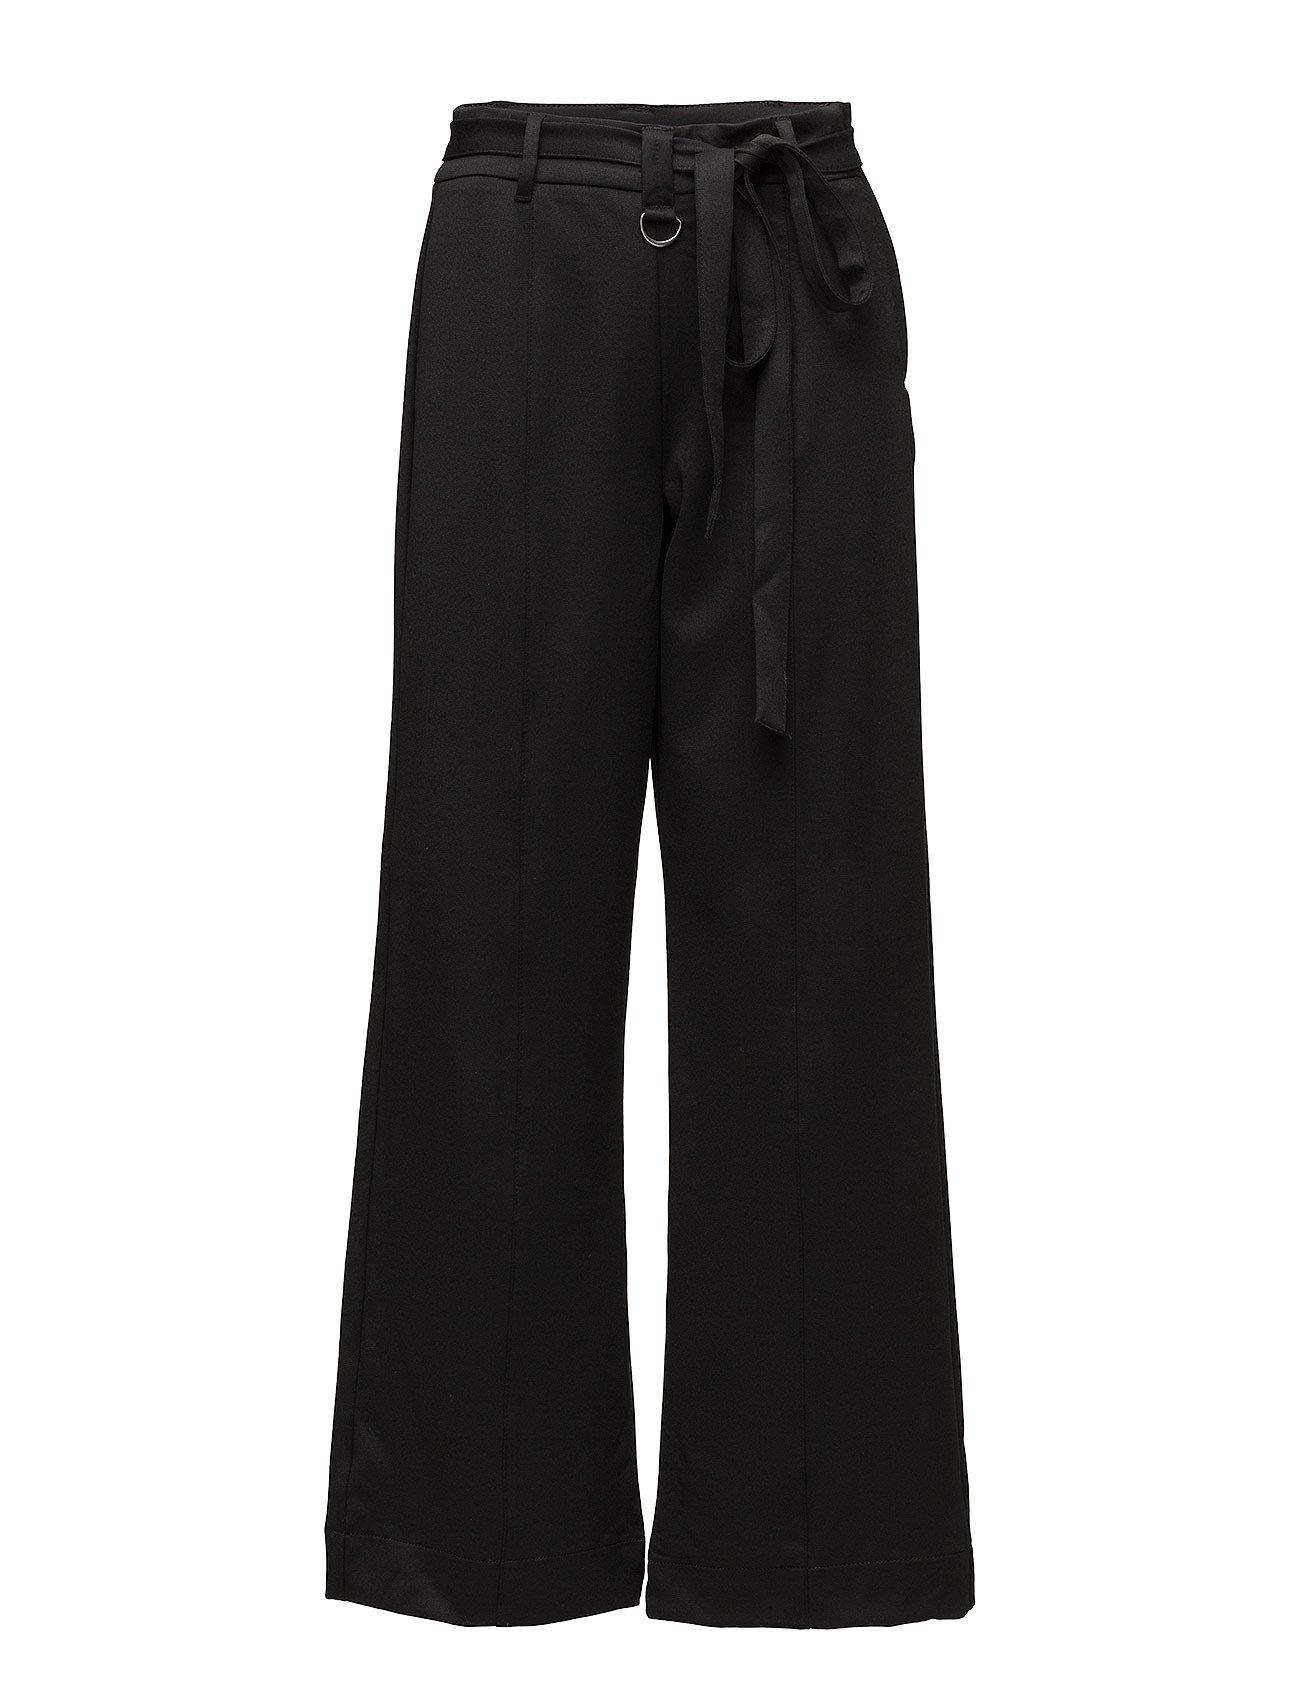 2nd one Hailey 819 black shine, pants på boozt.com dk